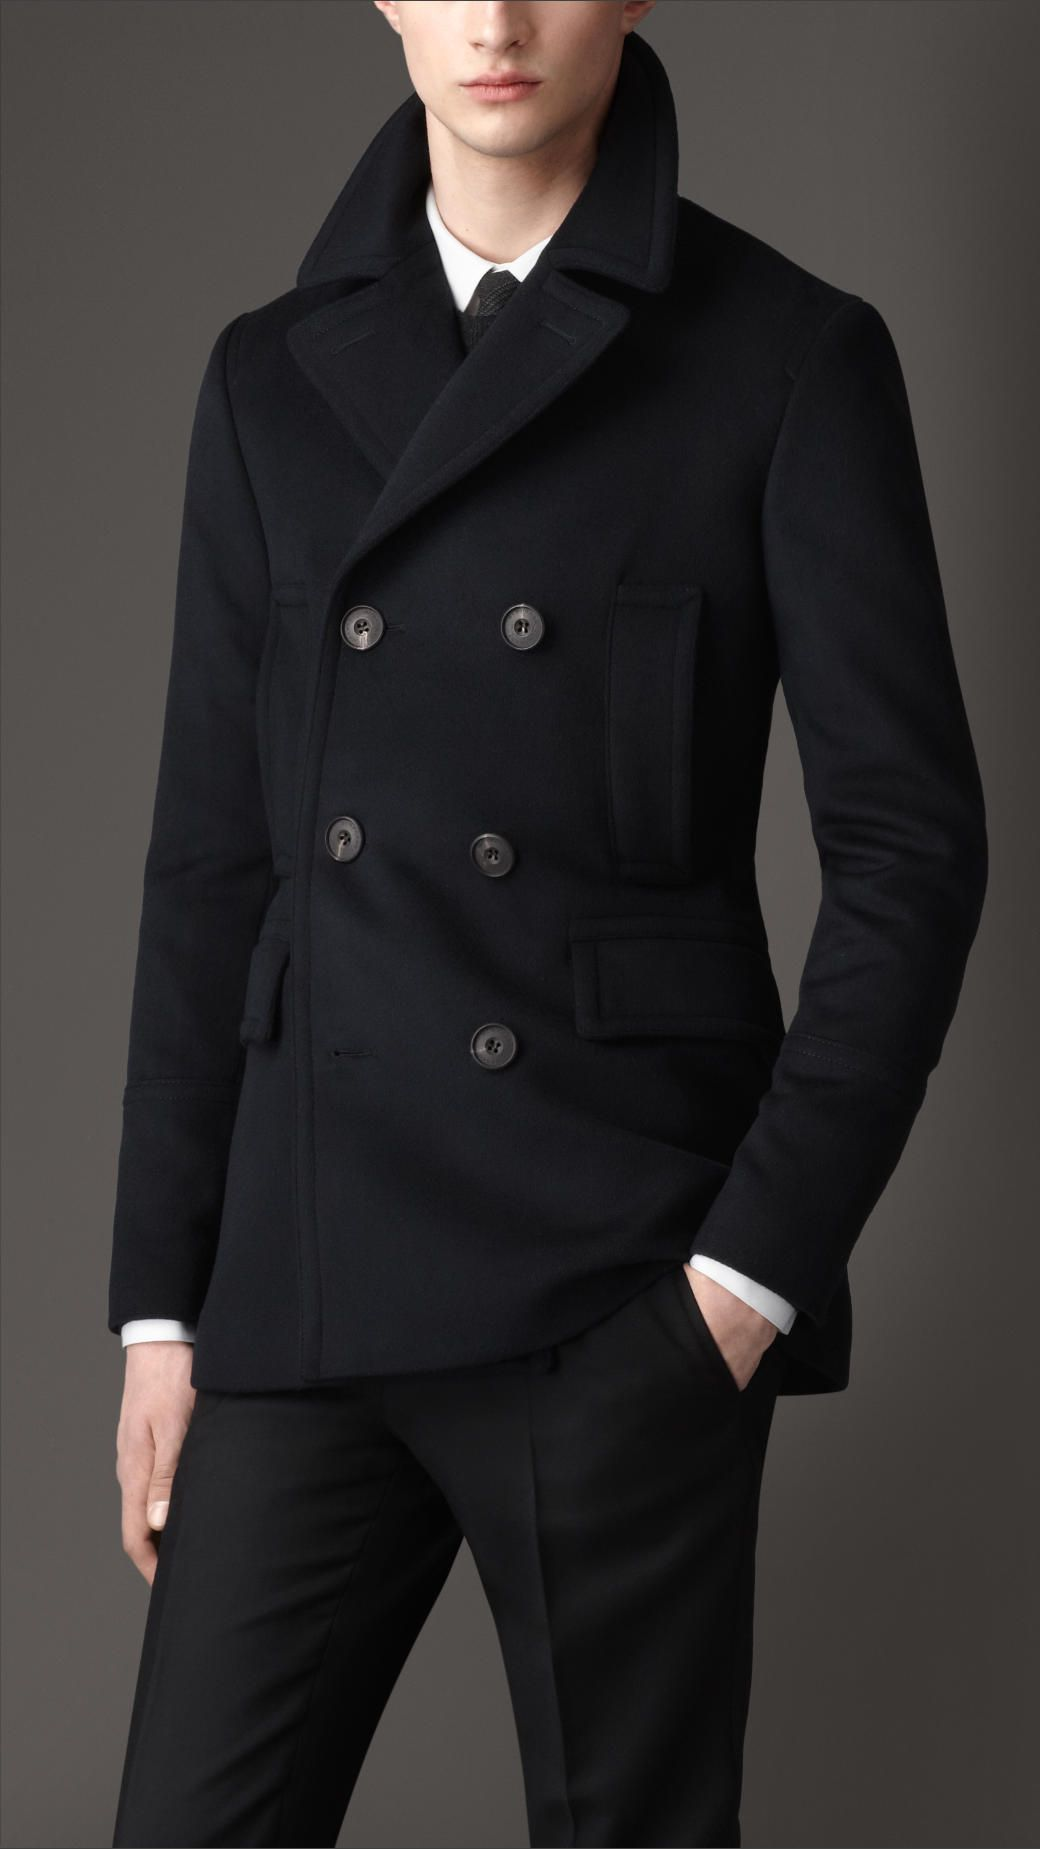 a24c69e73a0 Virgin Wool Cashmere Pea Coat